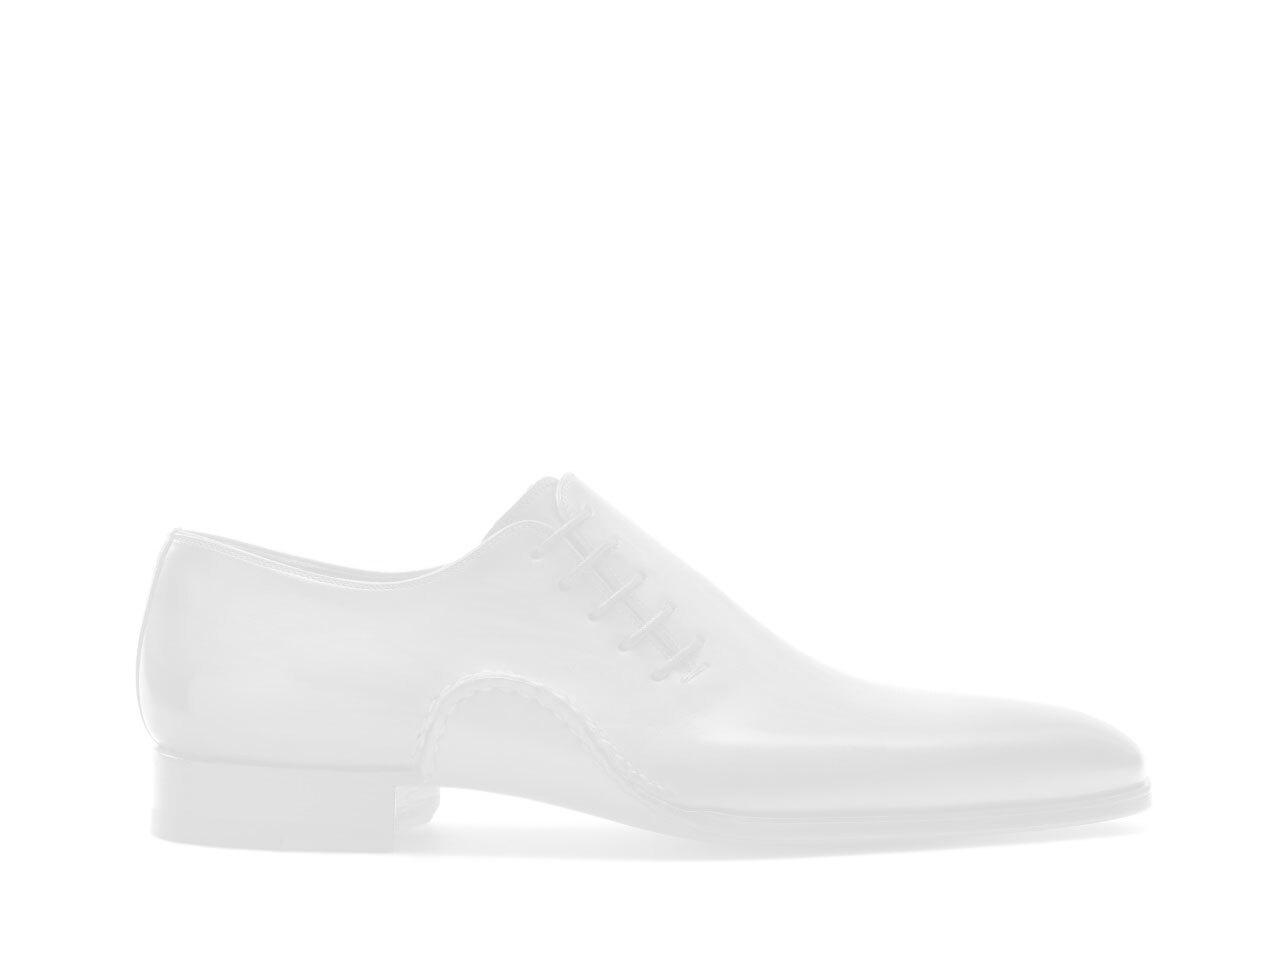 Pair of the Magnanni Marco II Cognac Suede Men's Single Monk Strap Shoes